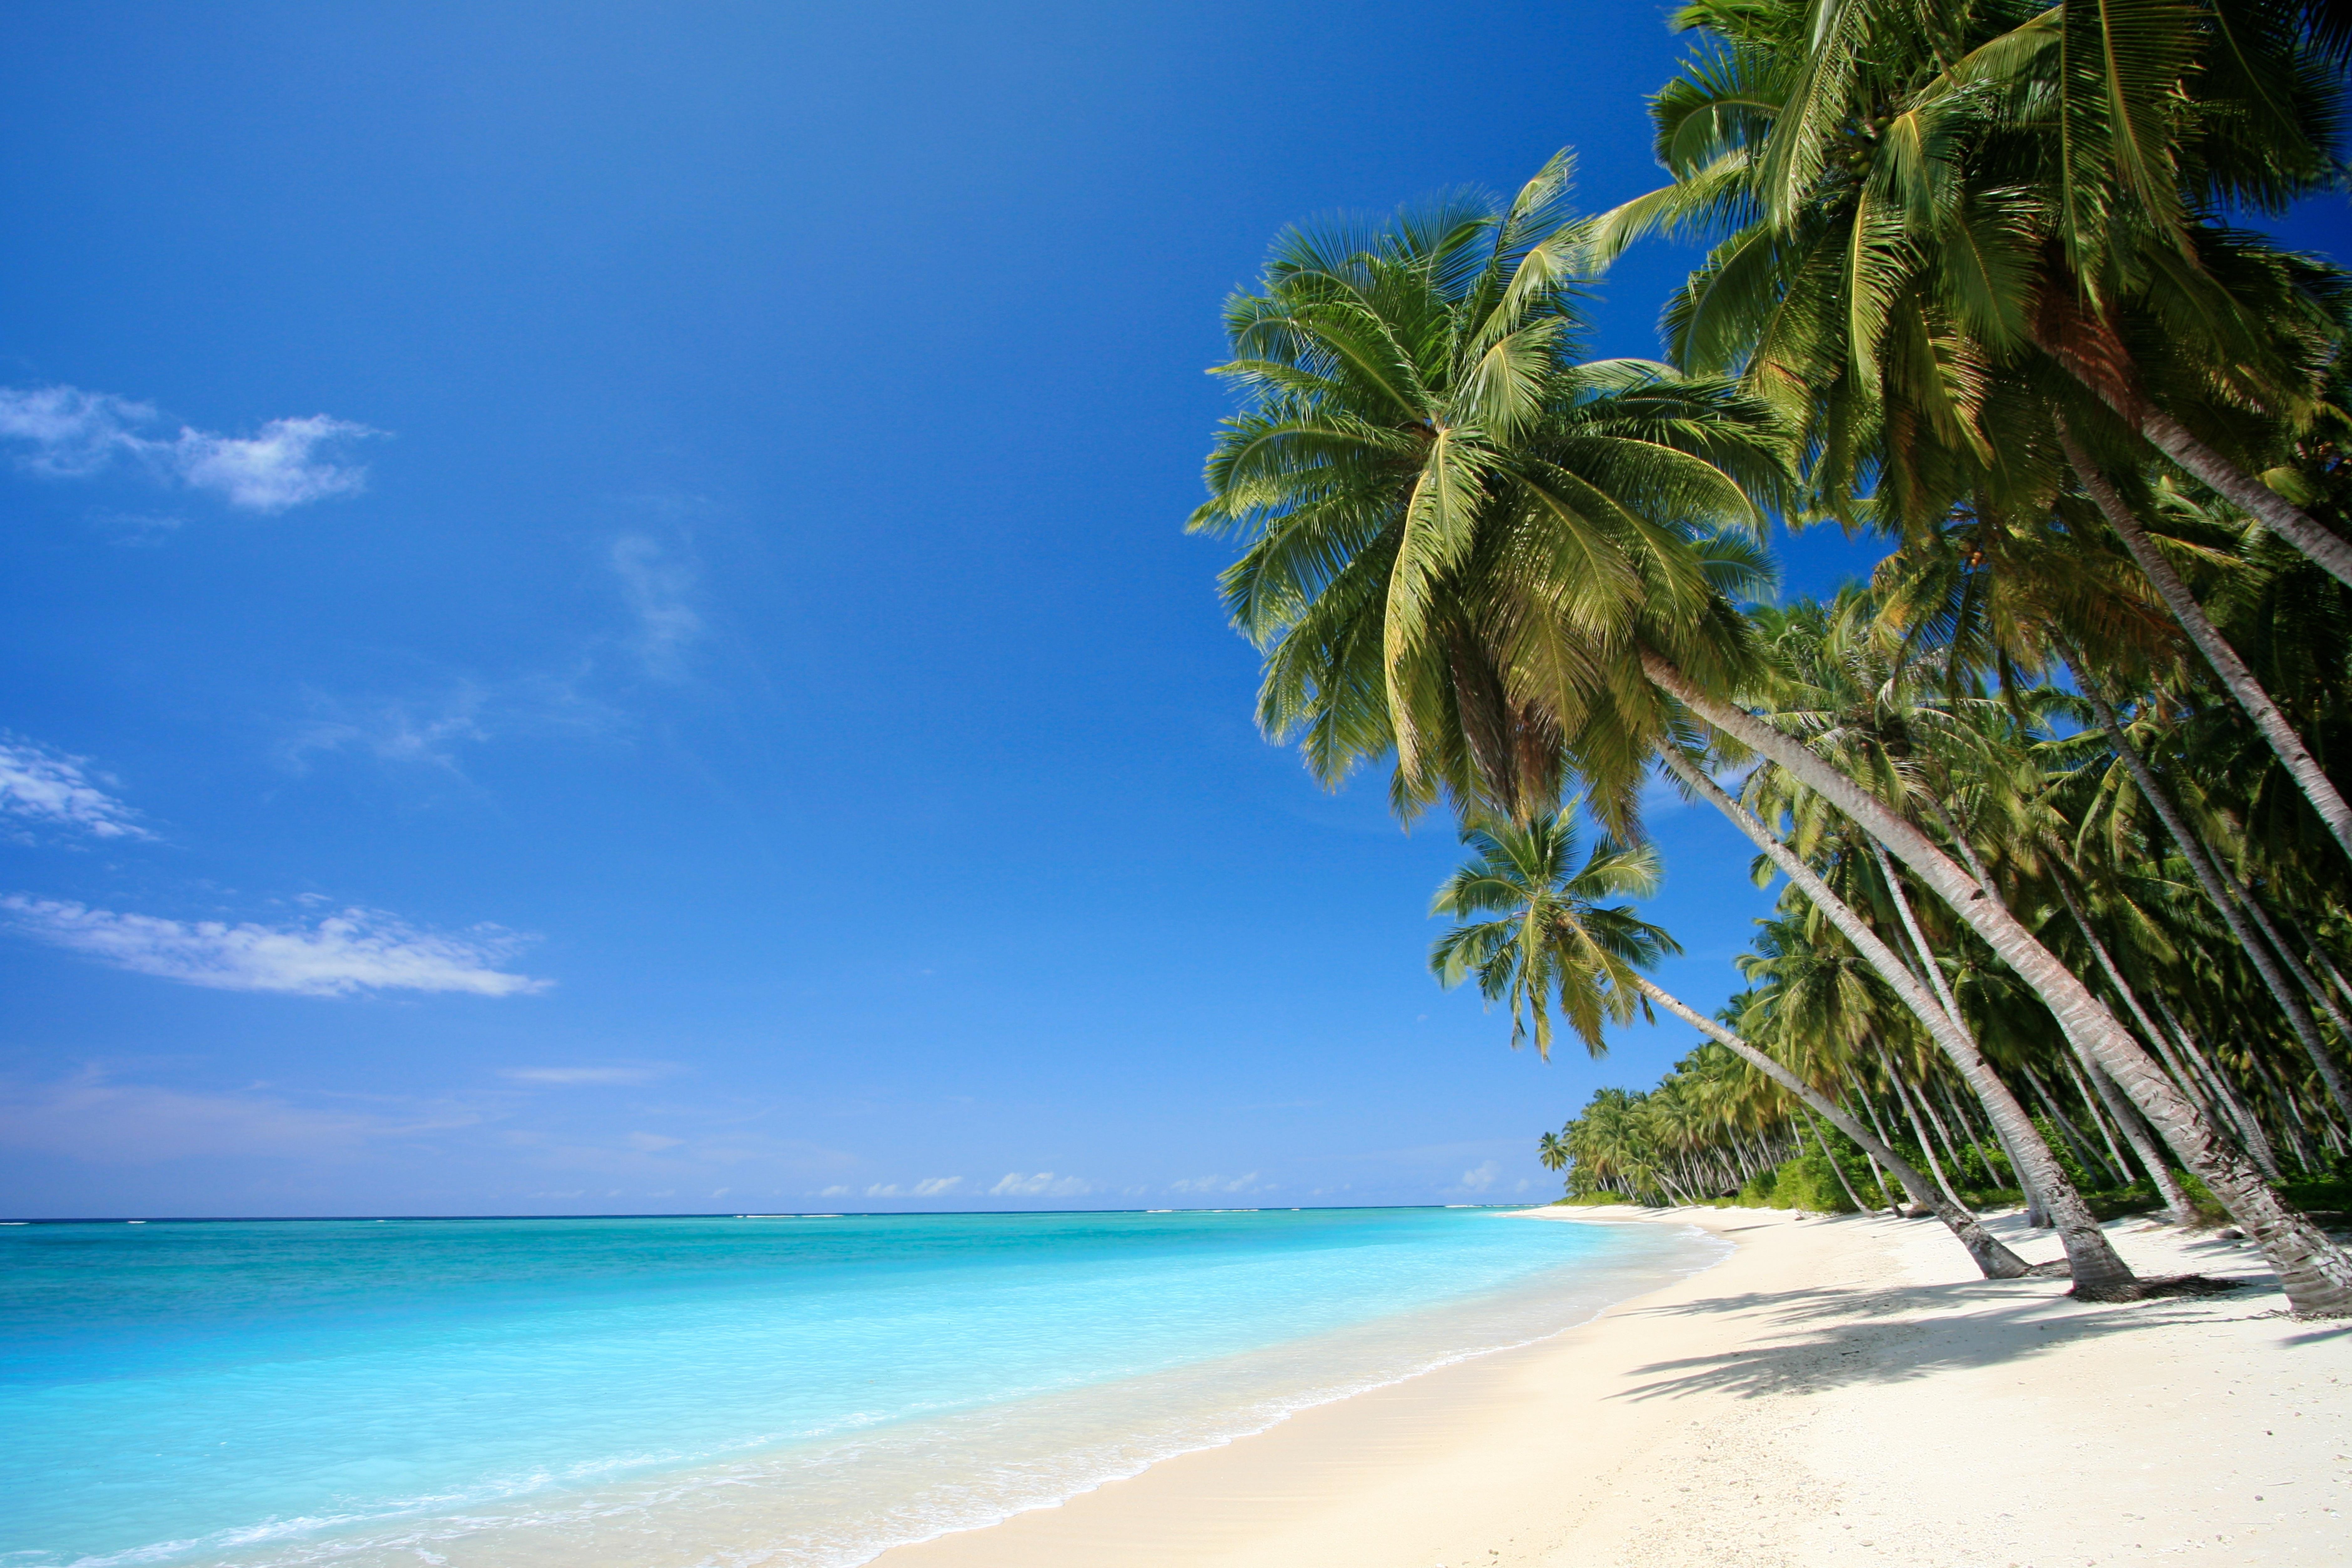 Tropical Beach Screensaver, wallpaper, Tropical Beach Screensaver hd ...